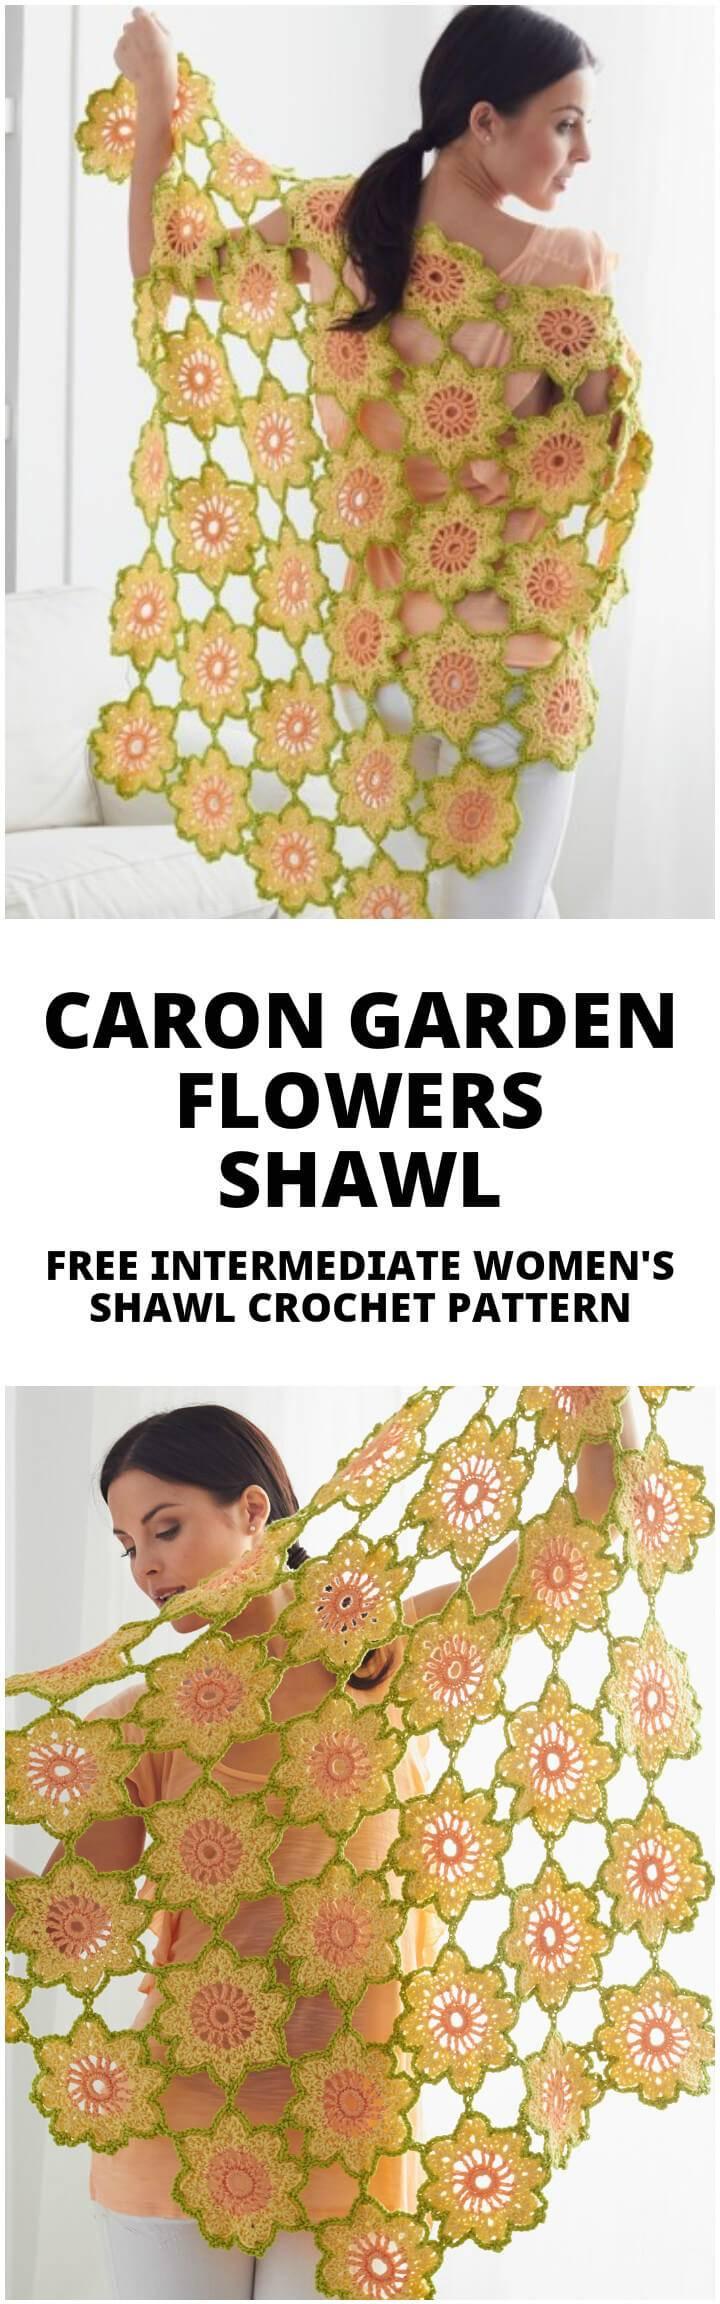 free crochet caron garden flowers shawl